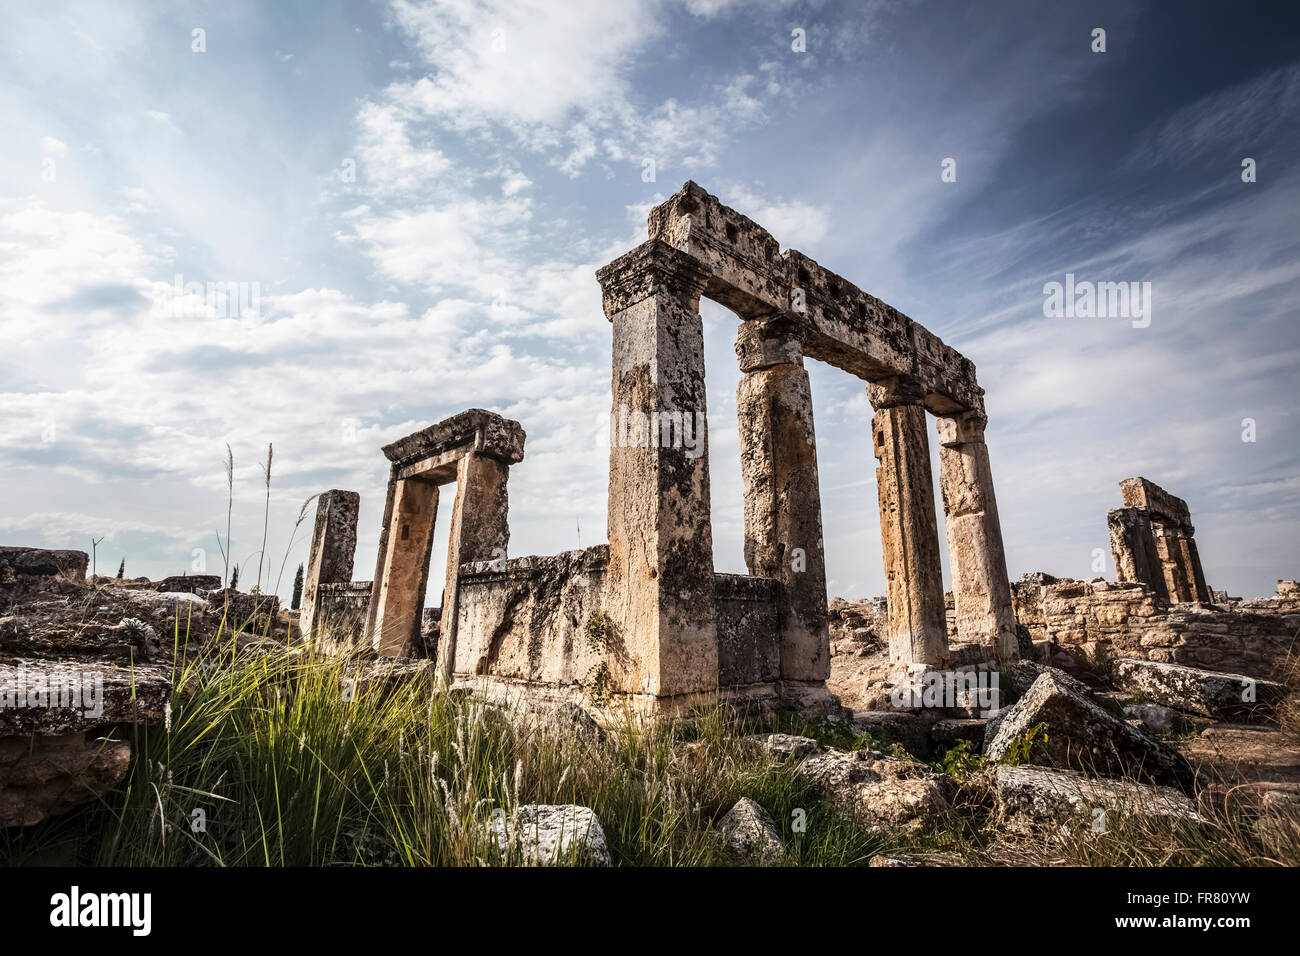 Greco-Roman ruins; Pamukkale, Turkey - Stock Image